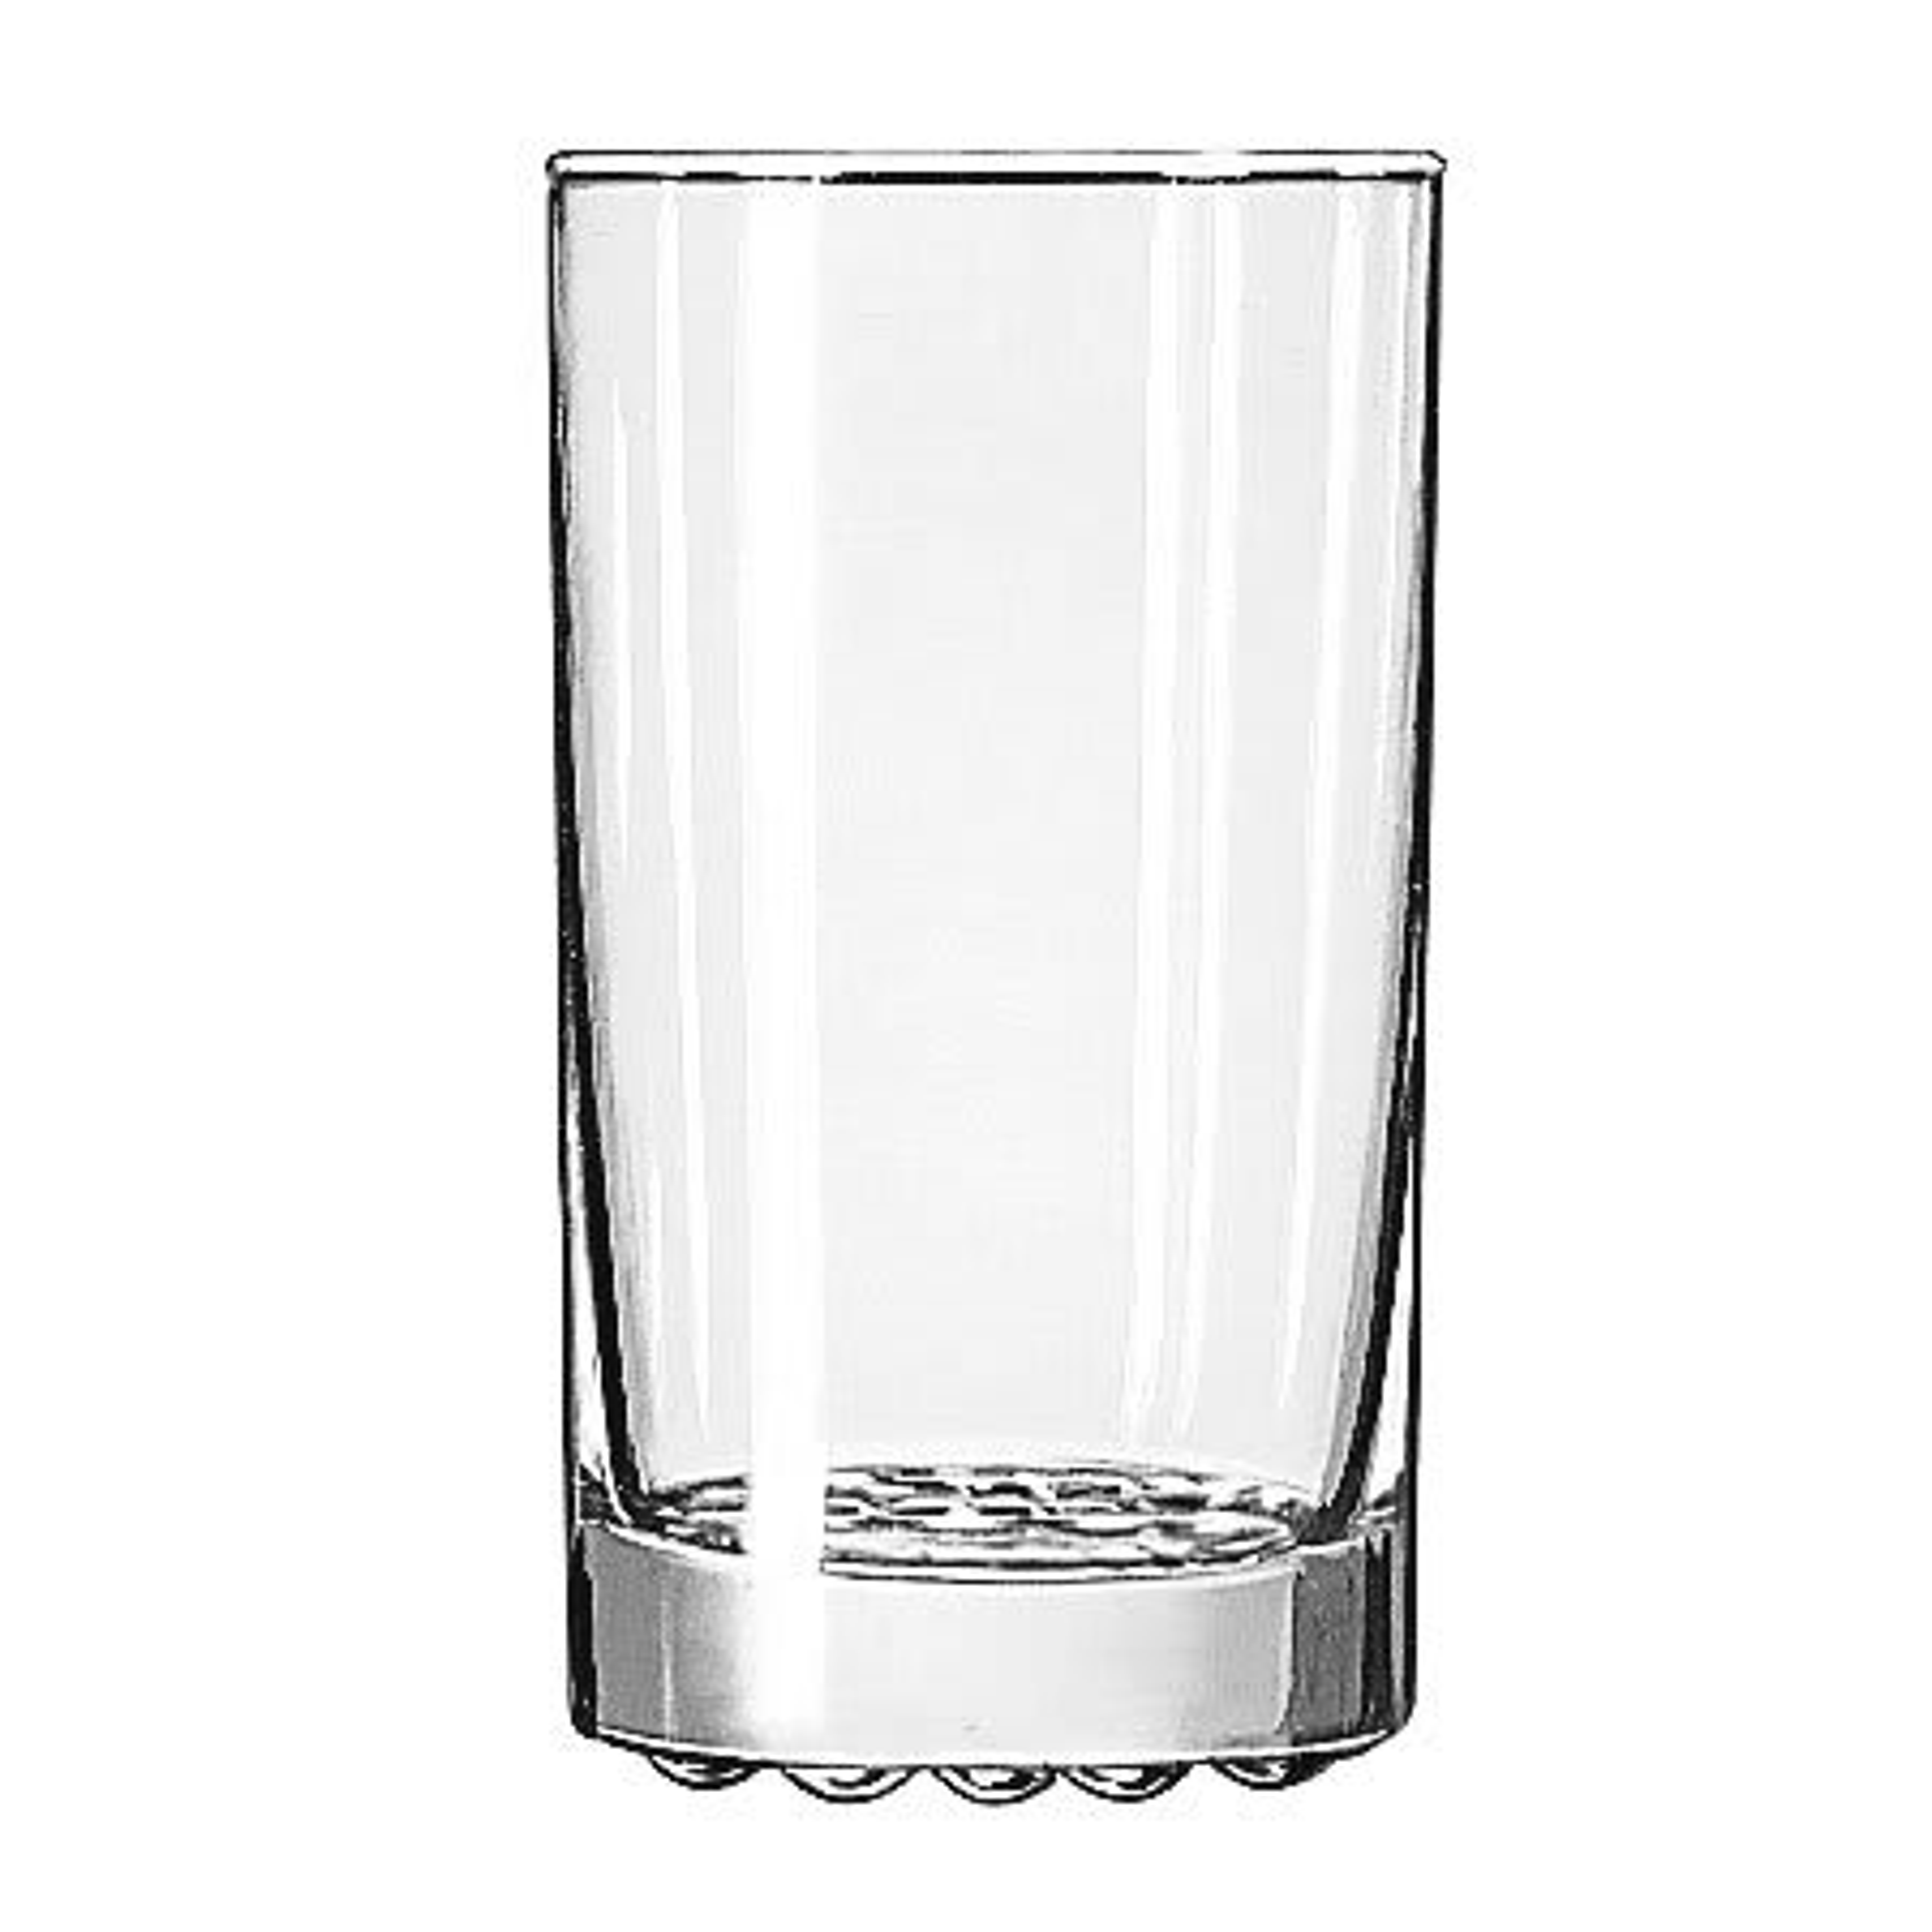 Libbey 23596 11.25 oz Nob Hill Beverage Glass - Safedge Rim Guarantee